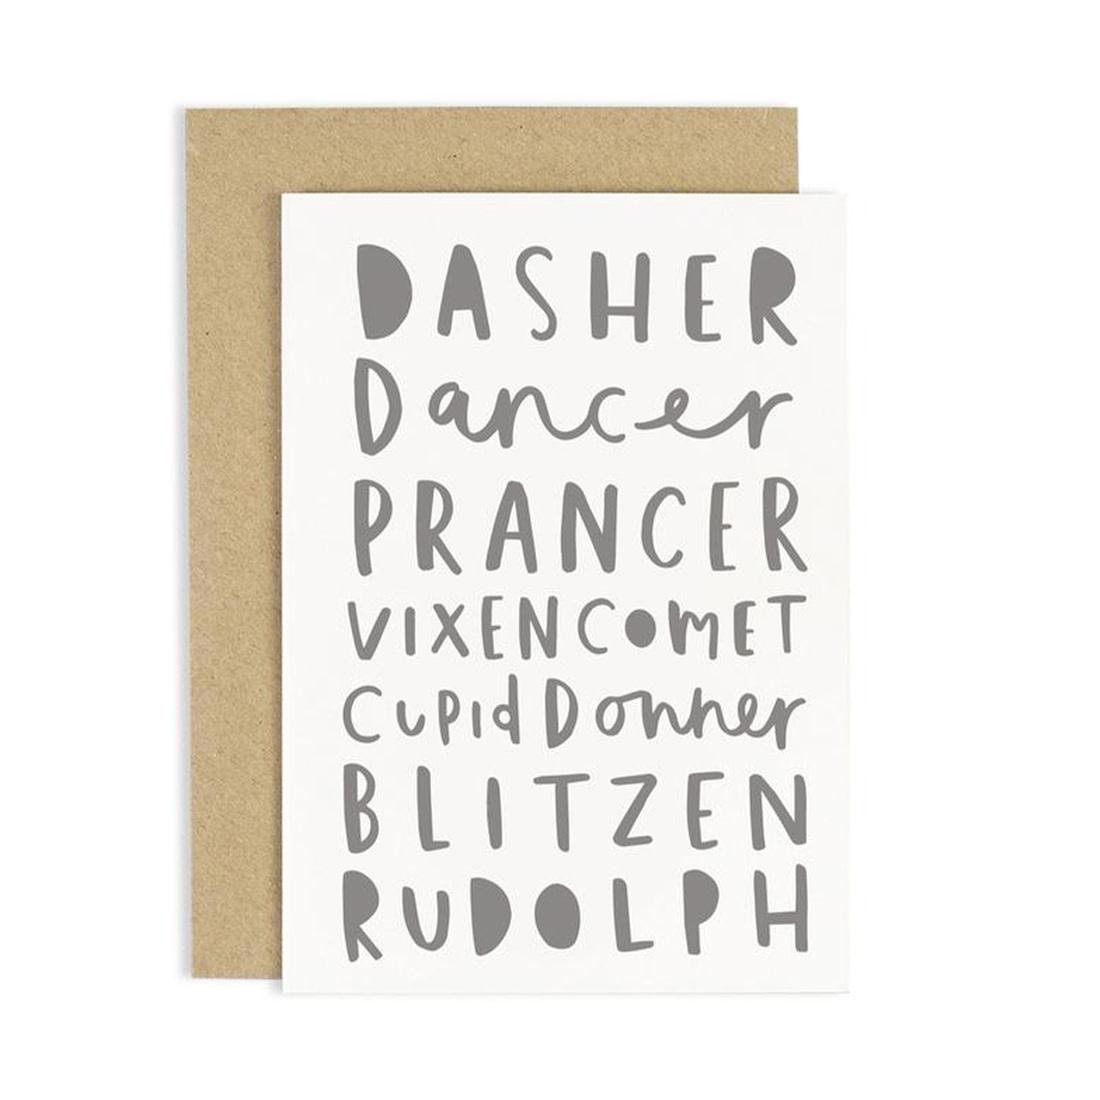 OLD ENGLISH Reindeer Names Card